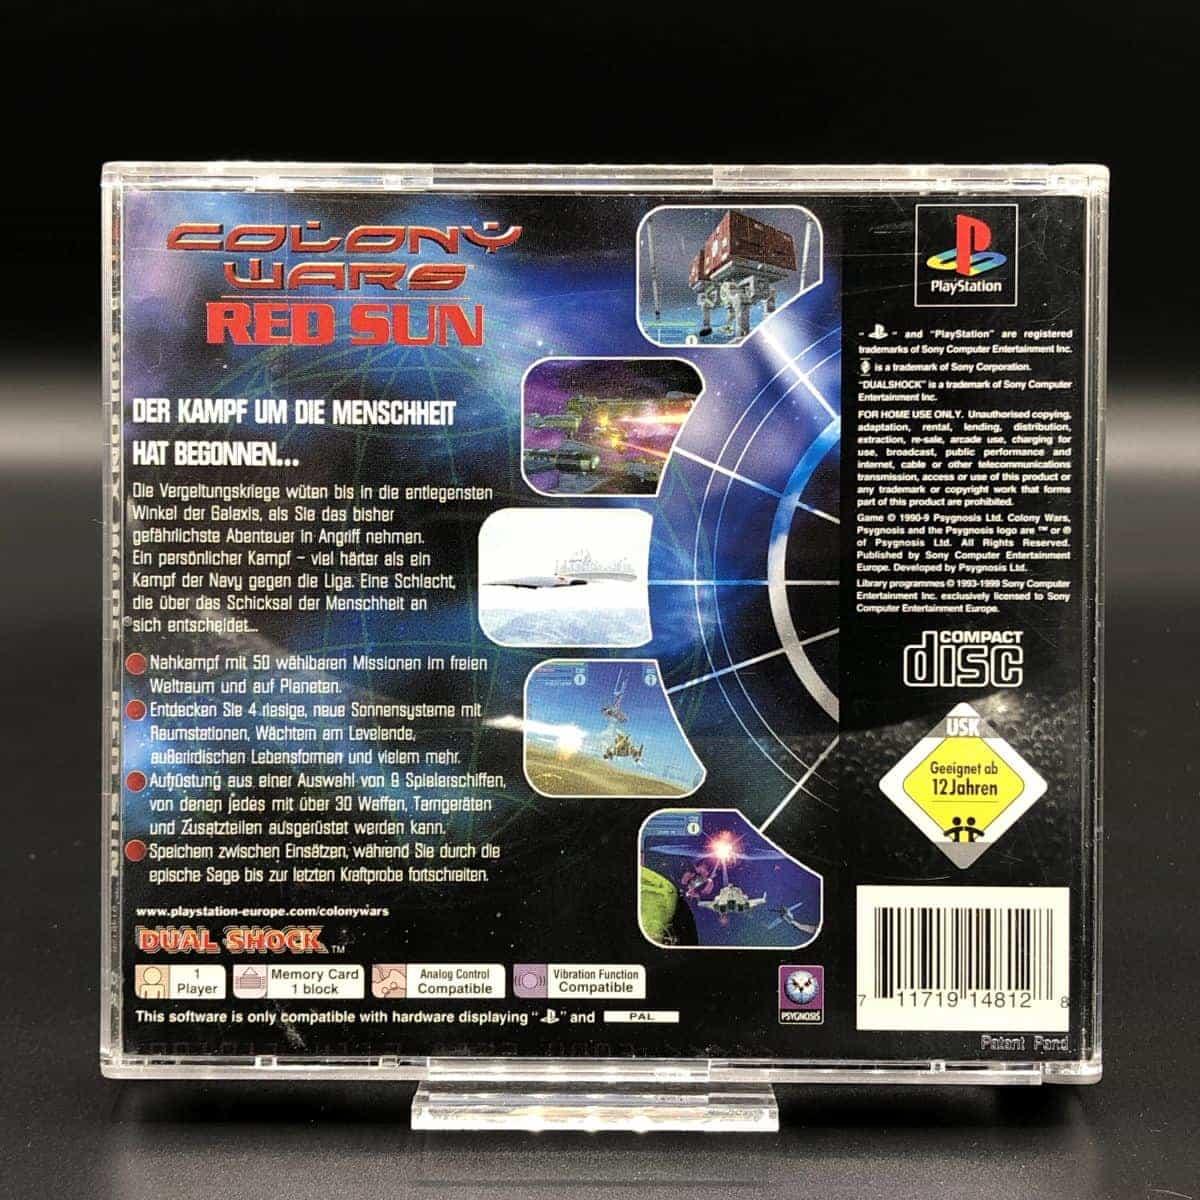 PS1 Colony Wars: Red Sun (Komplett) (Sehr gut) Sony PlayStation 1